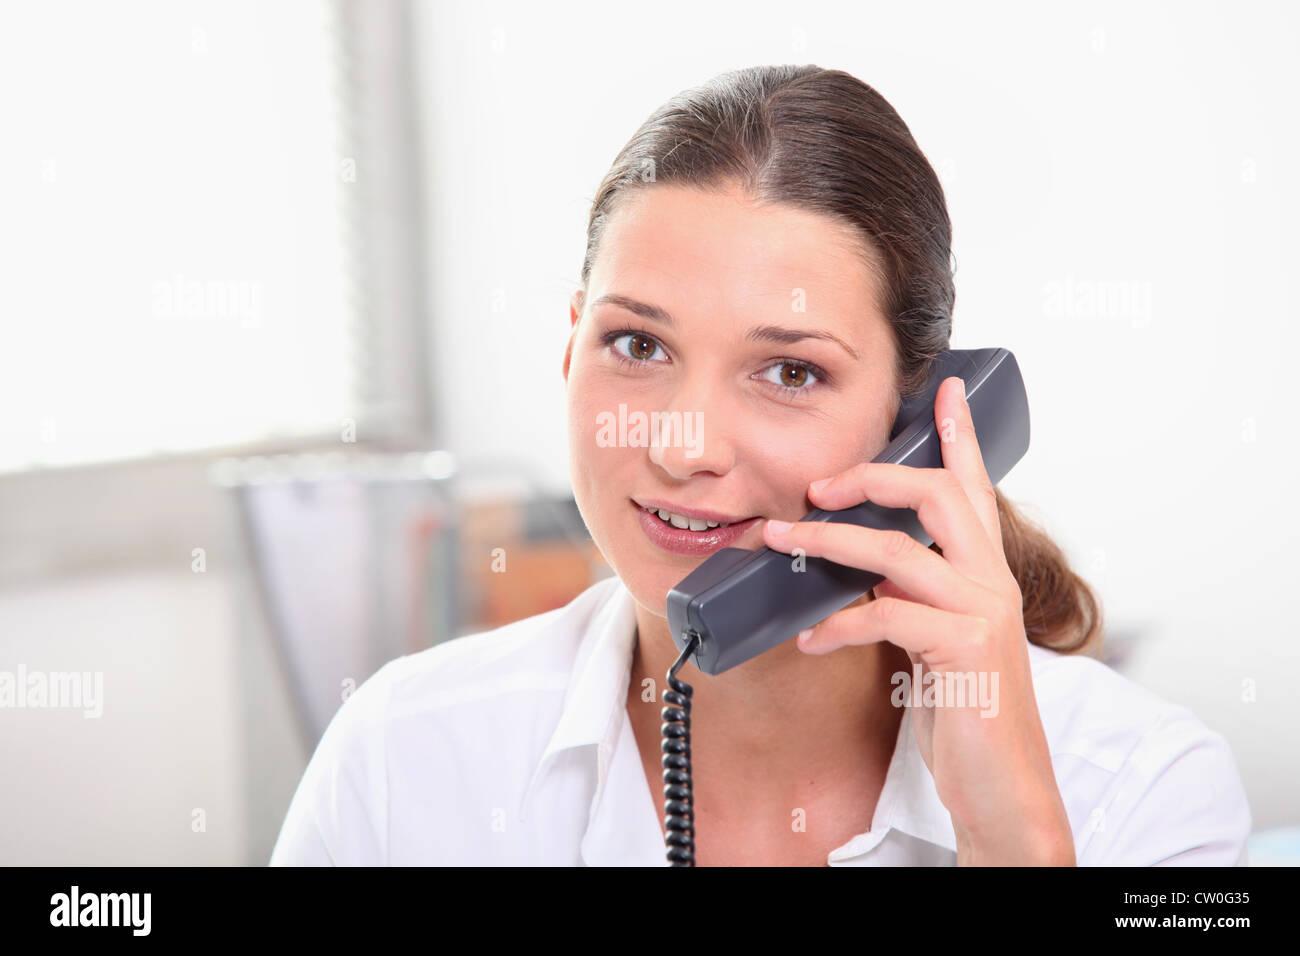 Secretary with telephone - Stock Image